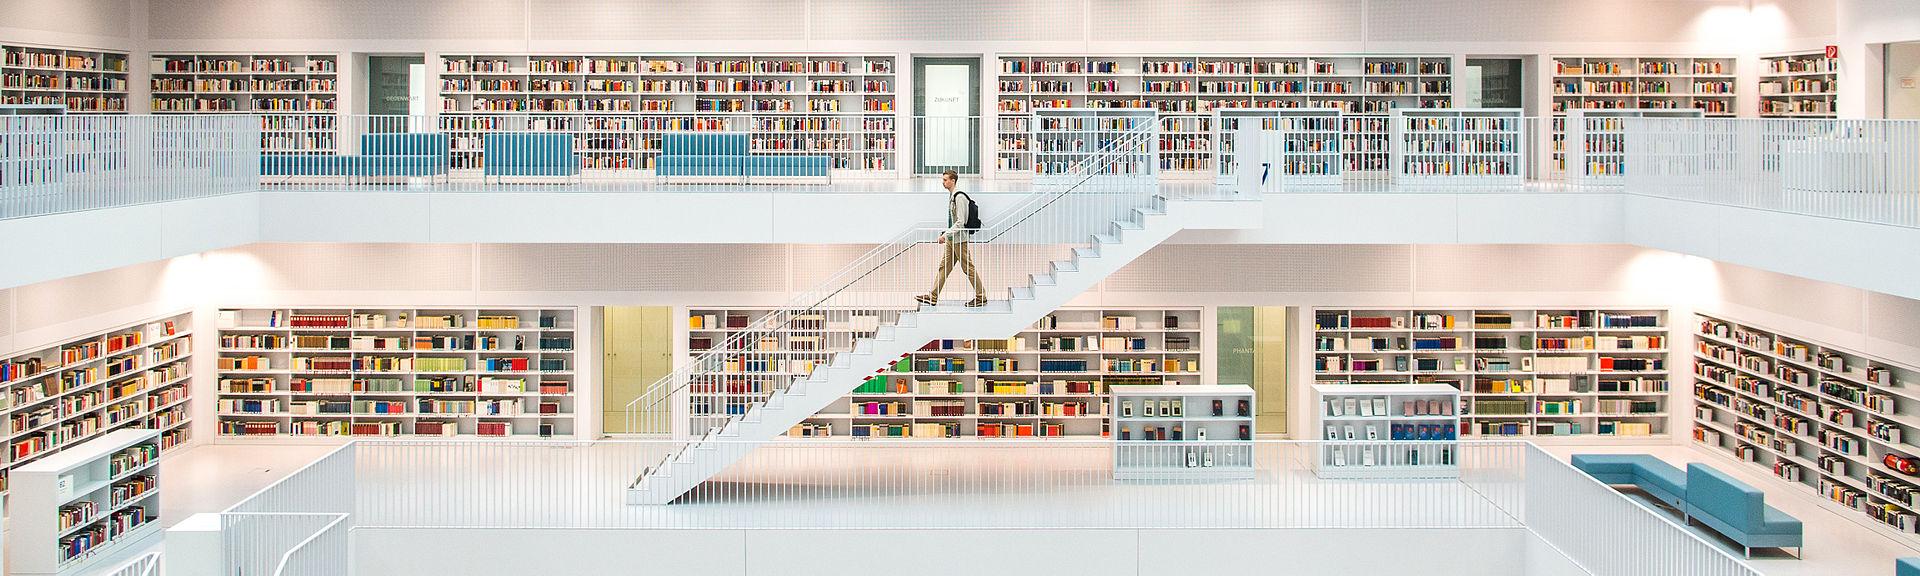 1920px-Stuttgart_library_interior-1